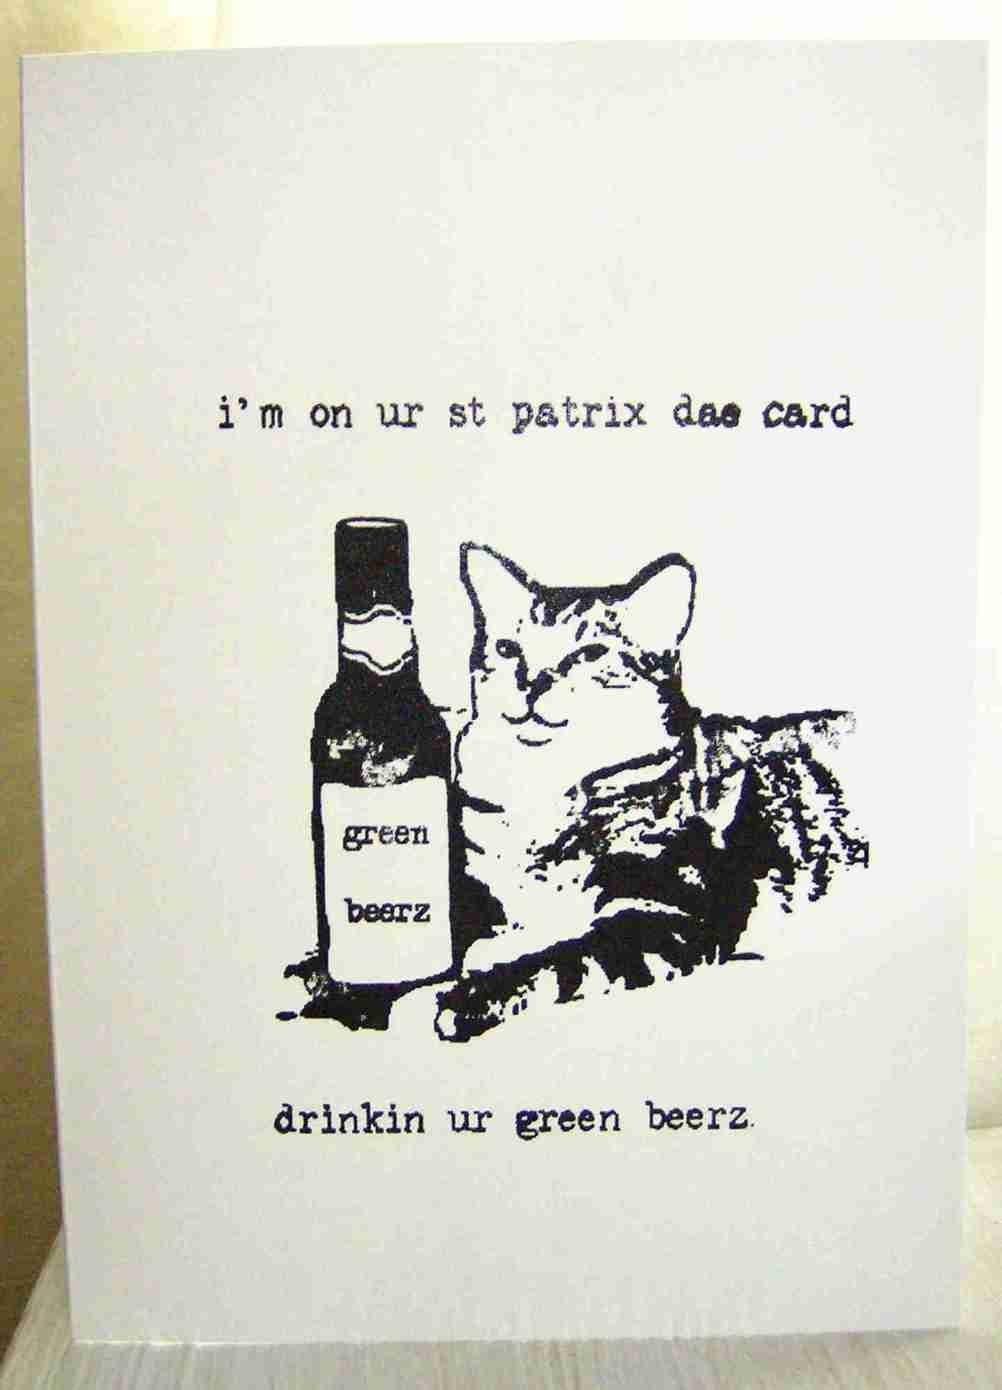 I'm on ur st patrix dae card, drinkin ur greenbeerz